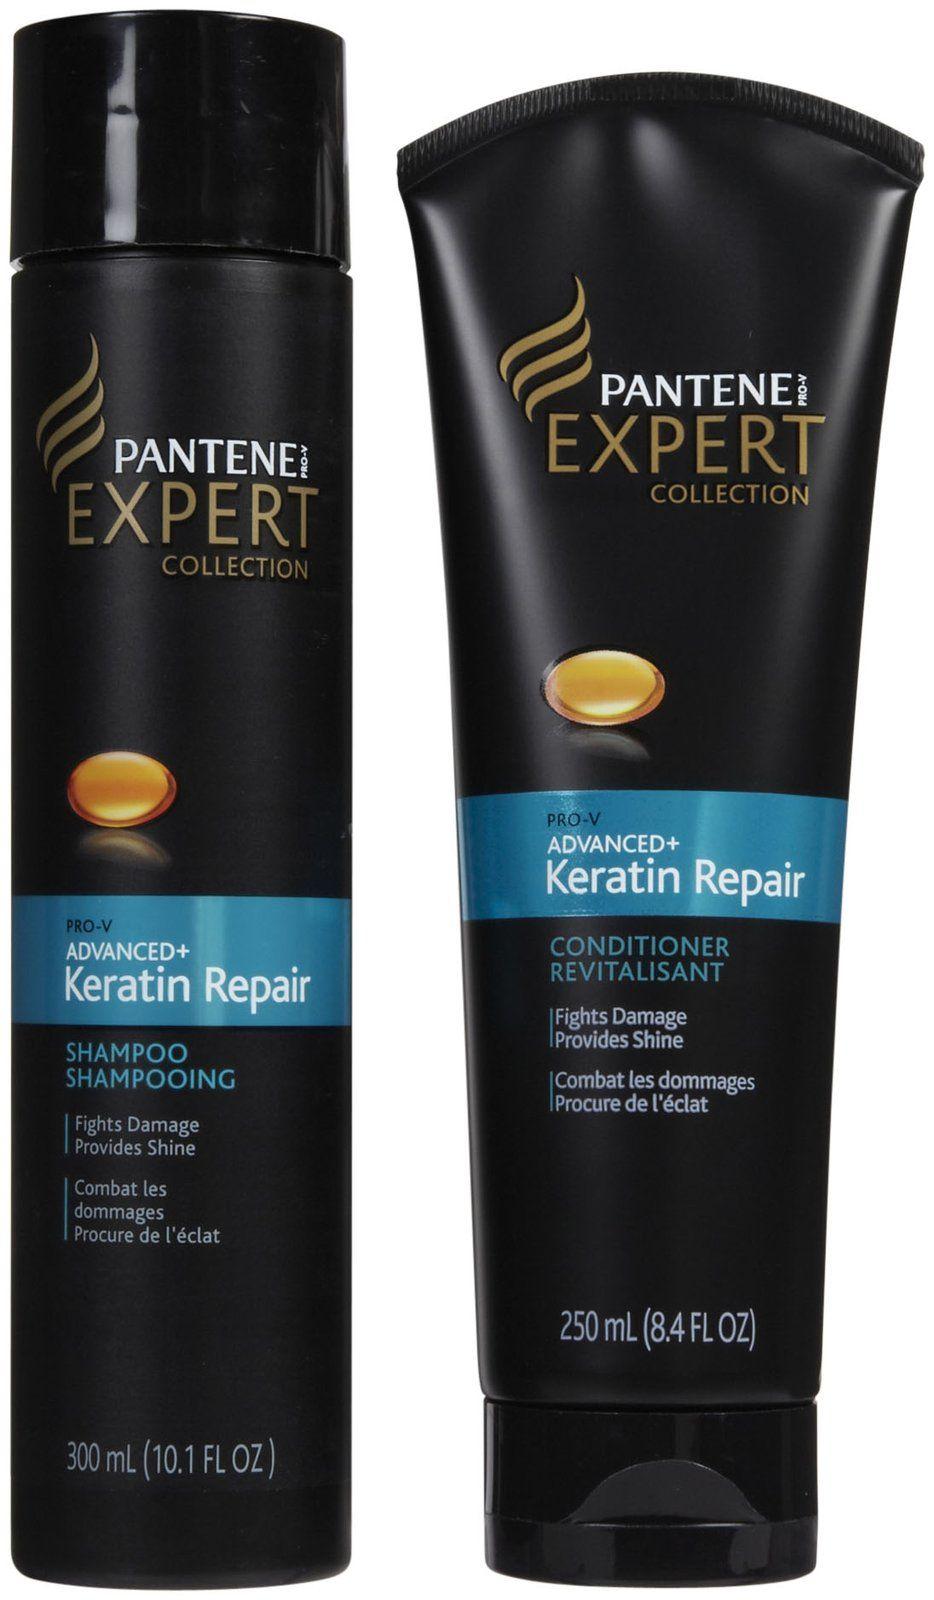 Pantene ProV Expert Collection Advanced Keratin Repair